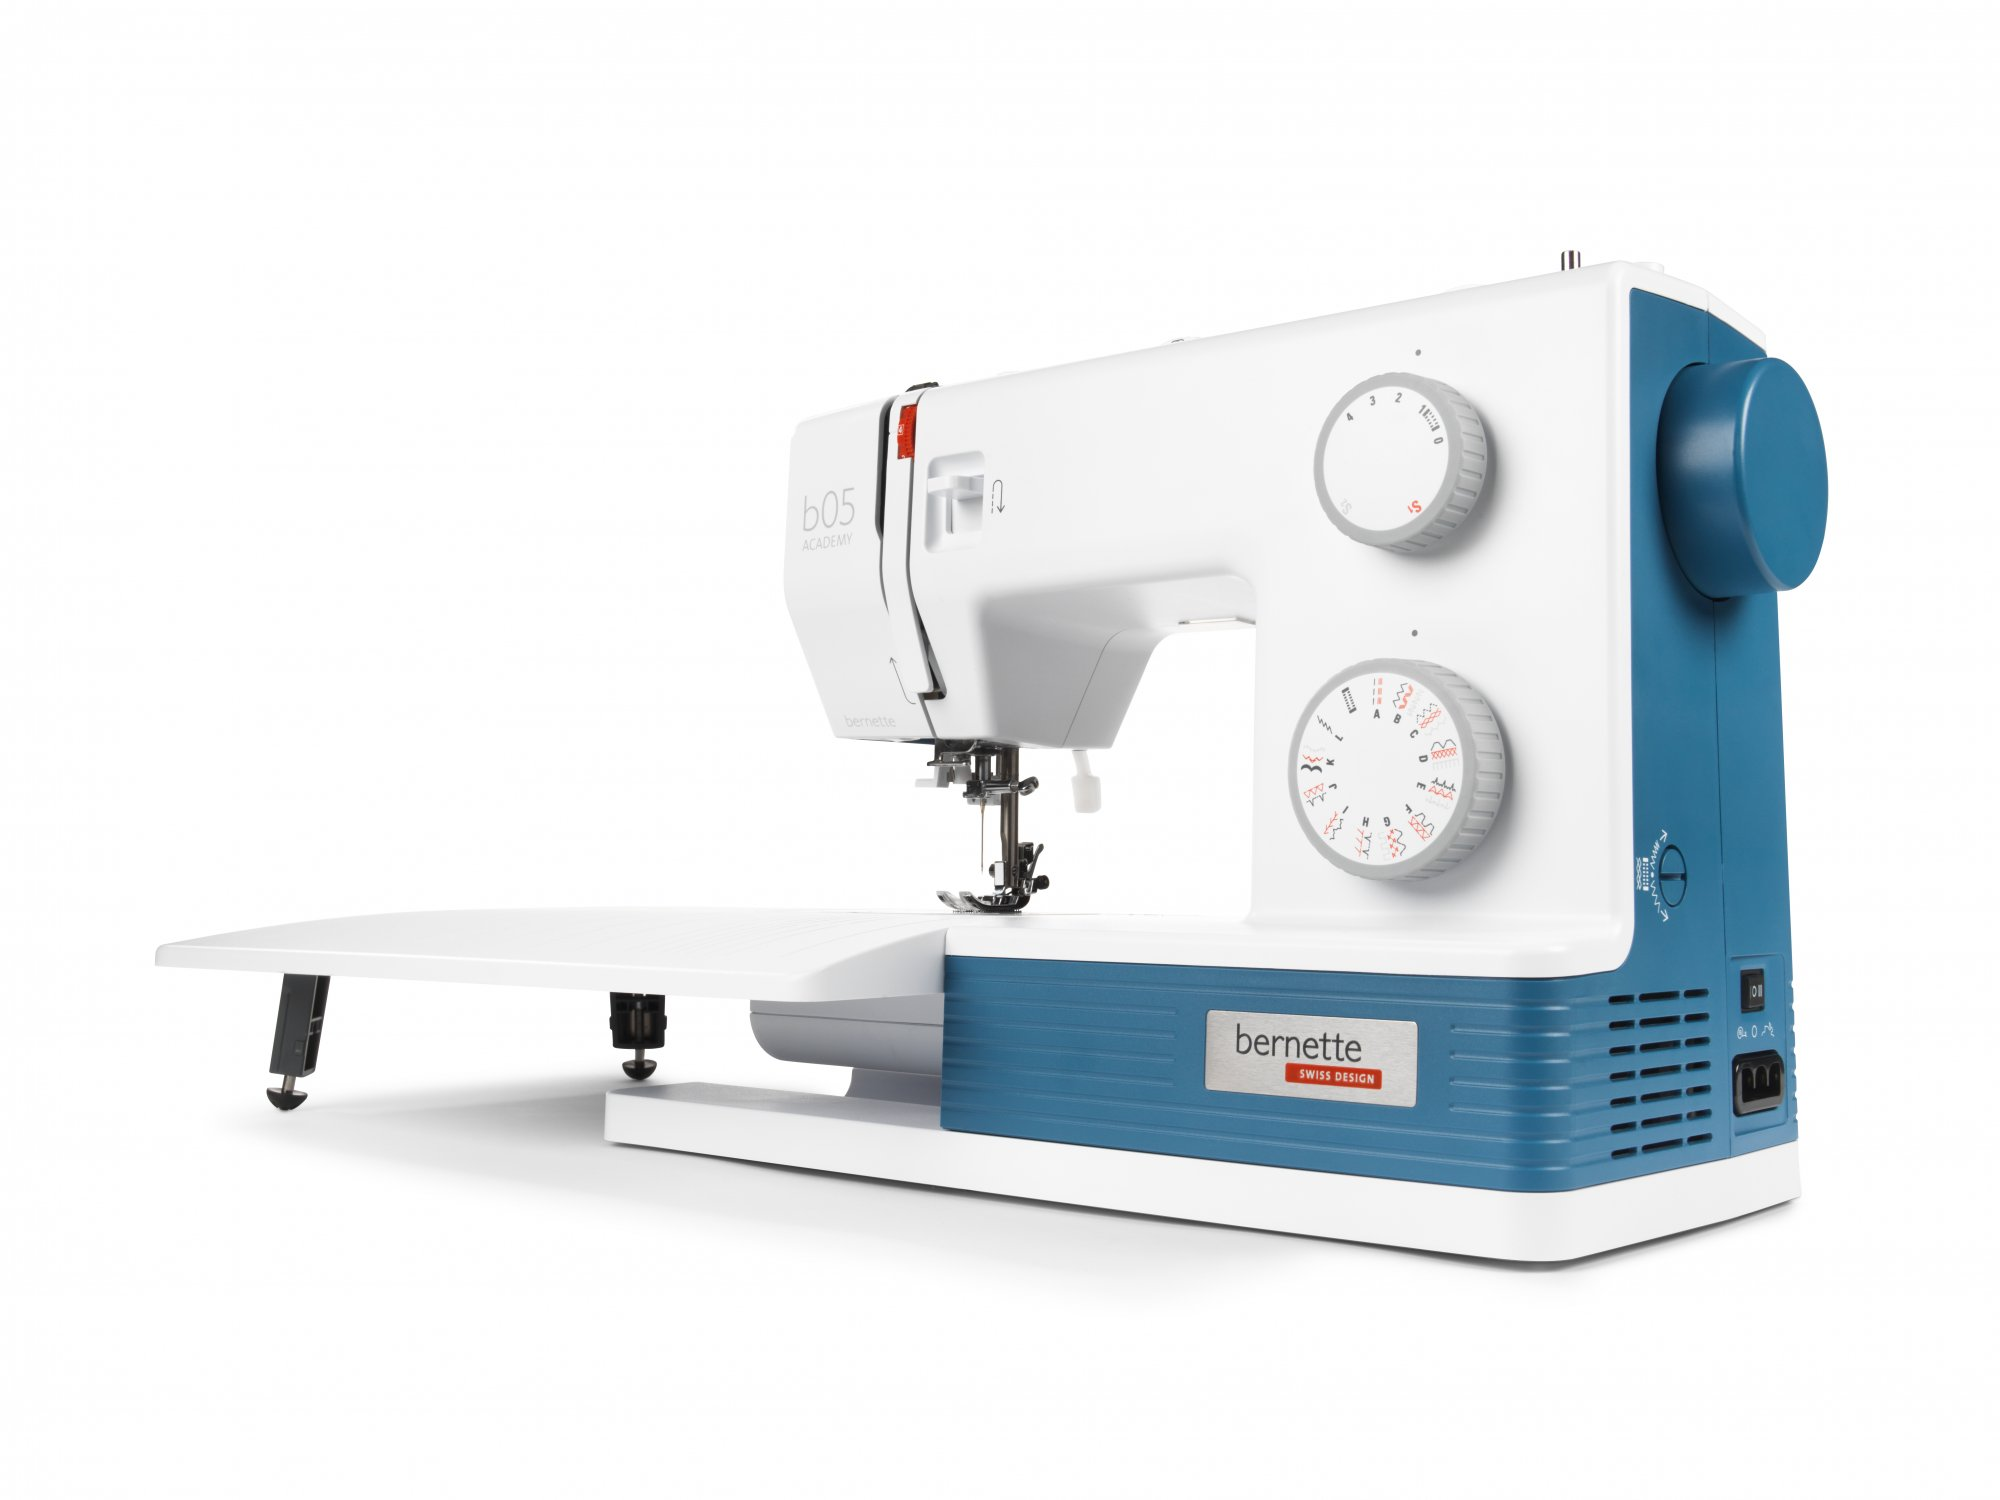 bernette b05 - Academy Industrial